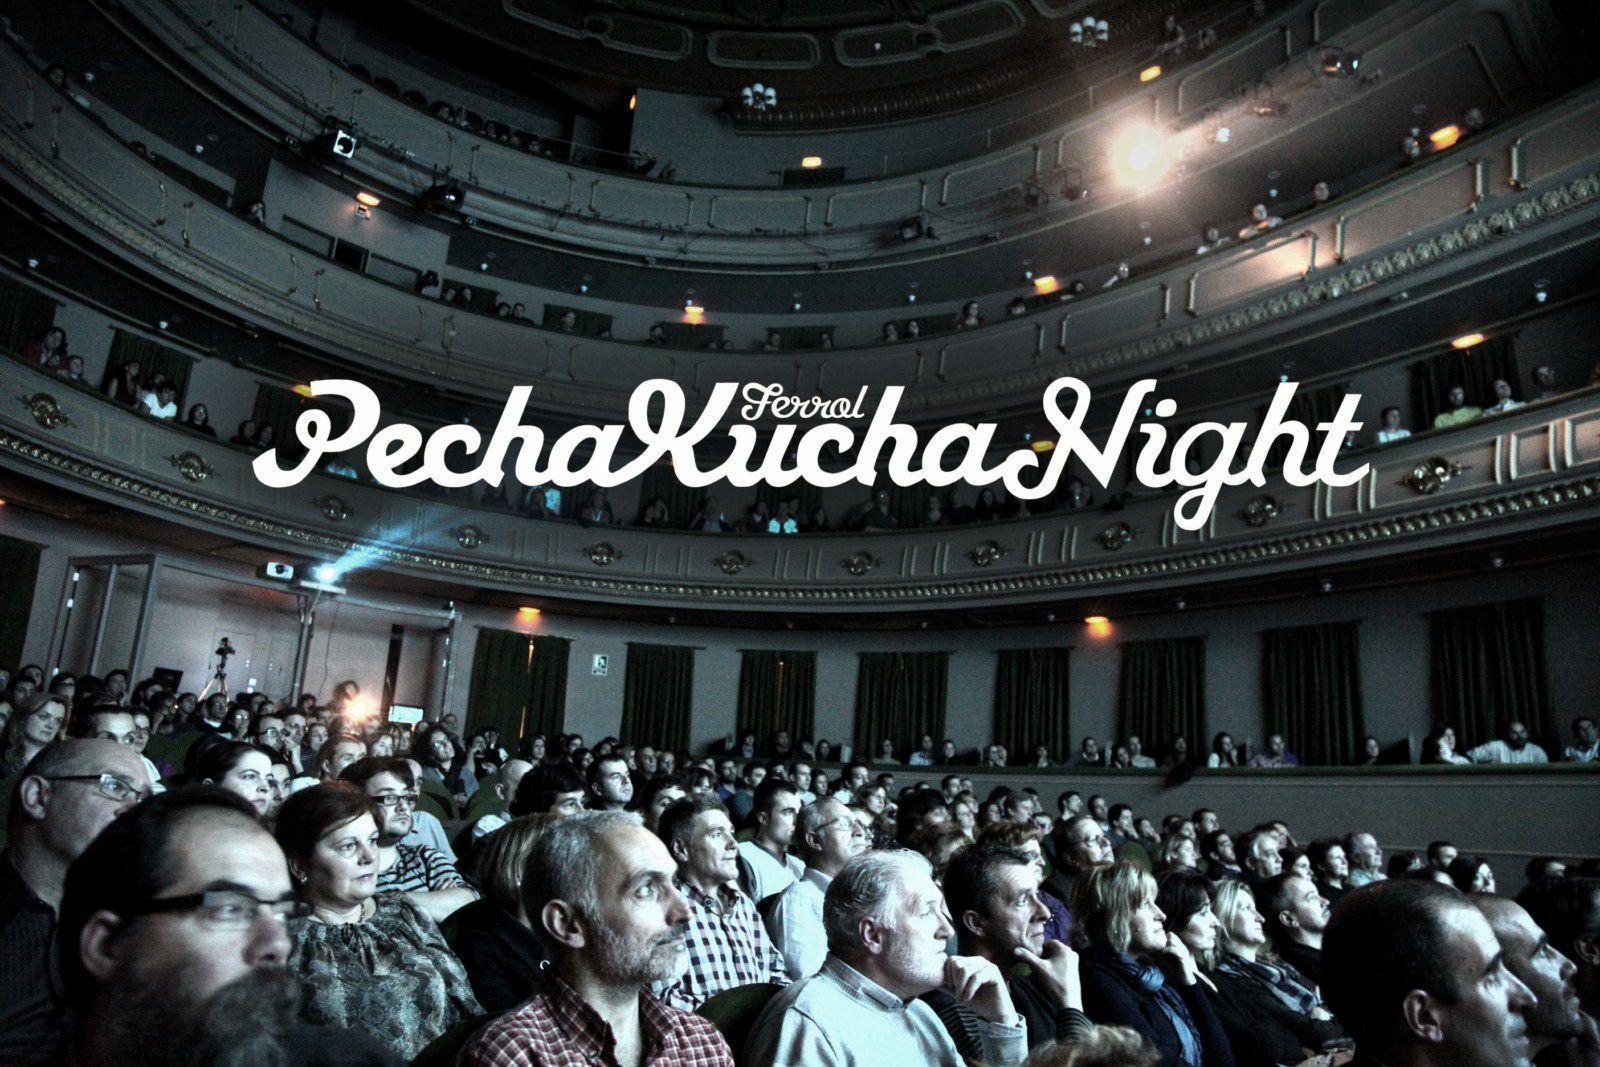 pecha kucha Pechakucha night october 24, 2018 5:30pm - 8:00pm $15 event cost register  premium membersto take advantage of your complimentary admission.